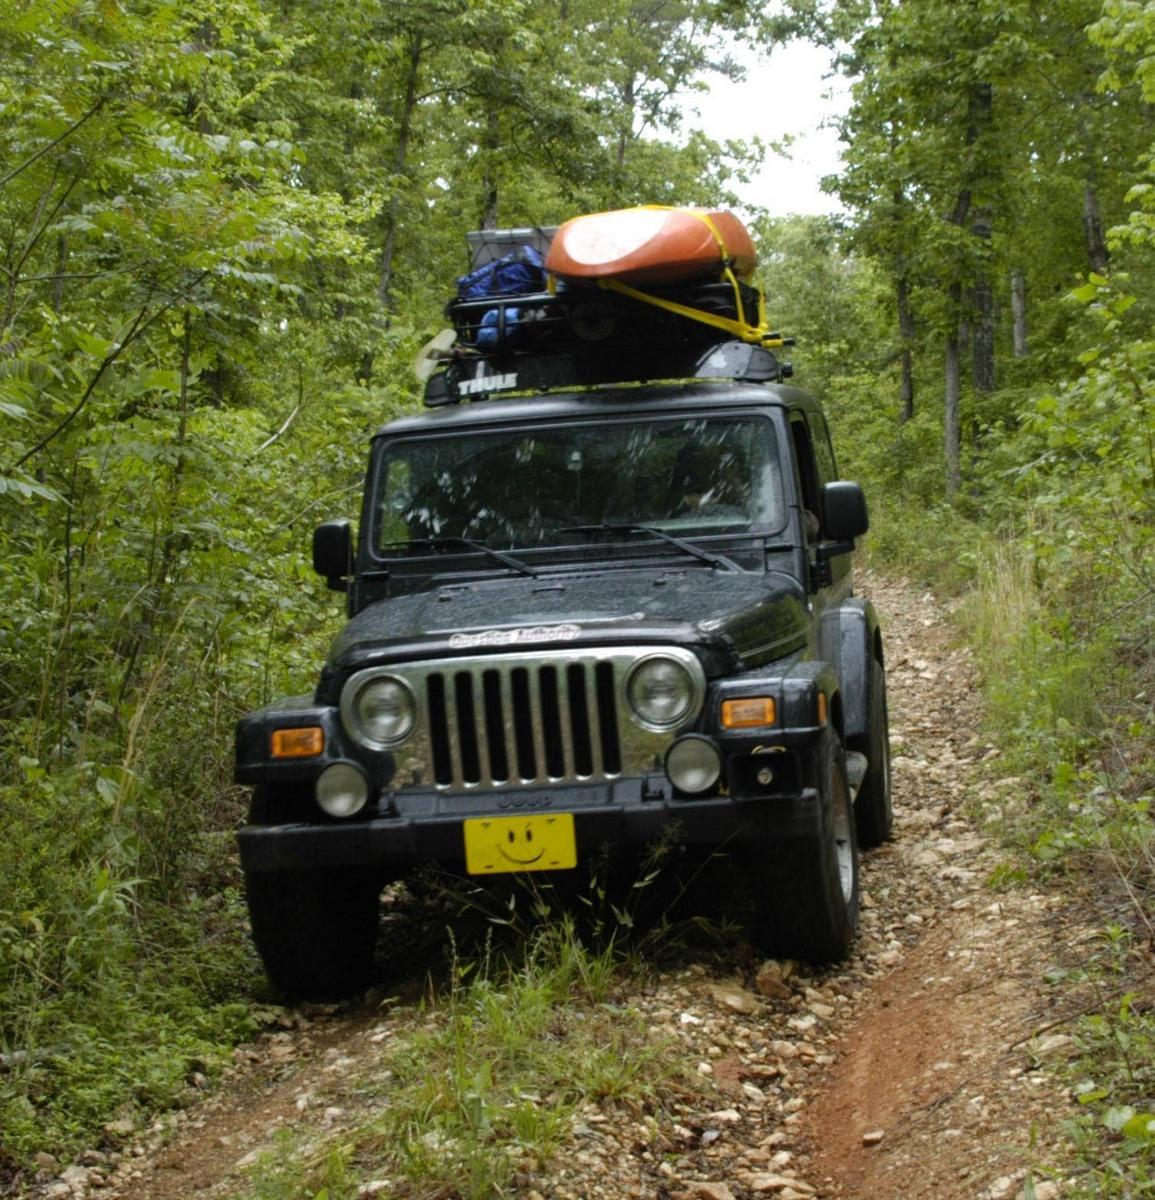 Improve Mpg The Factors Affecting Fuel Efficiency Vnutz Domain Jeep Wrangler Map Sensor Location Footnotes